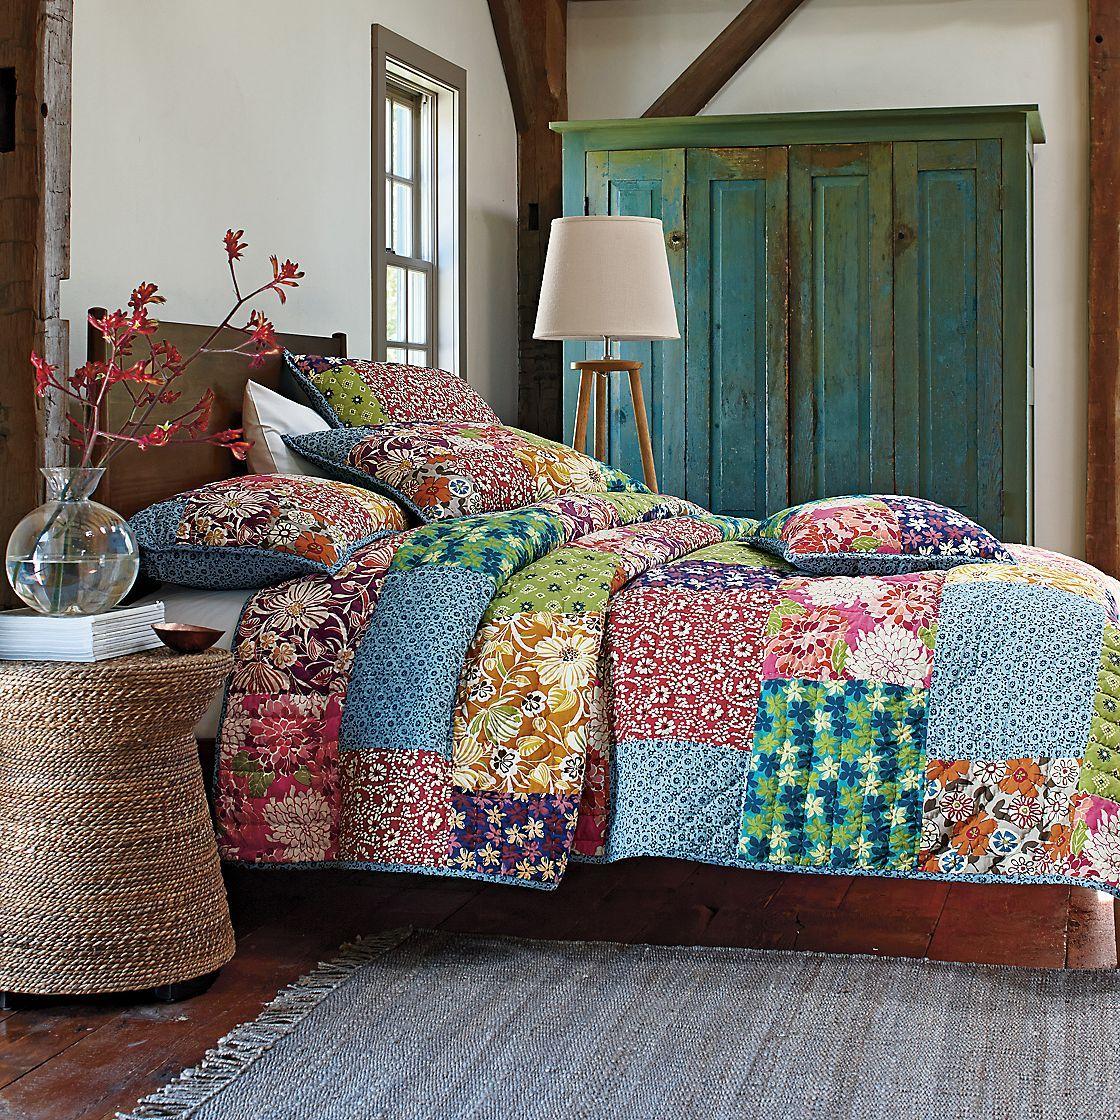 Matrimonio Bed Cover : Más de ideas increíbles sobre bed cover design en